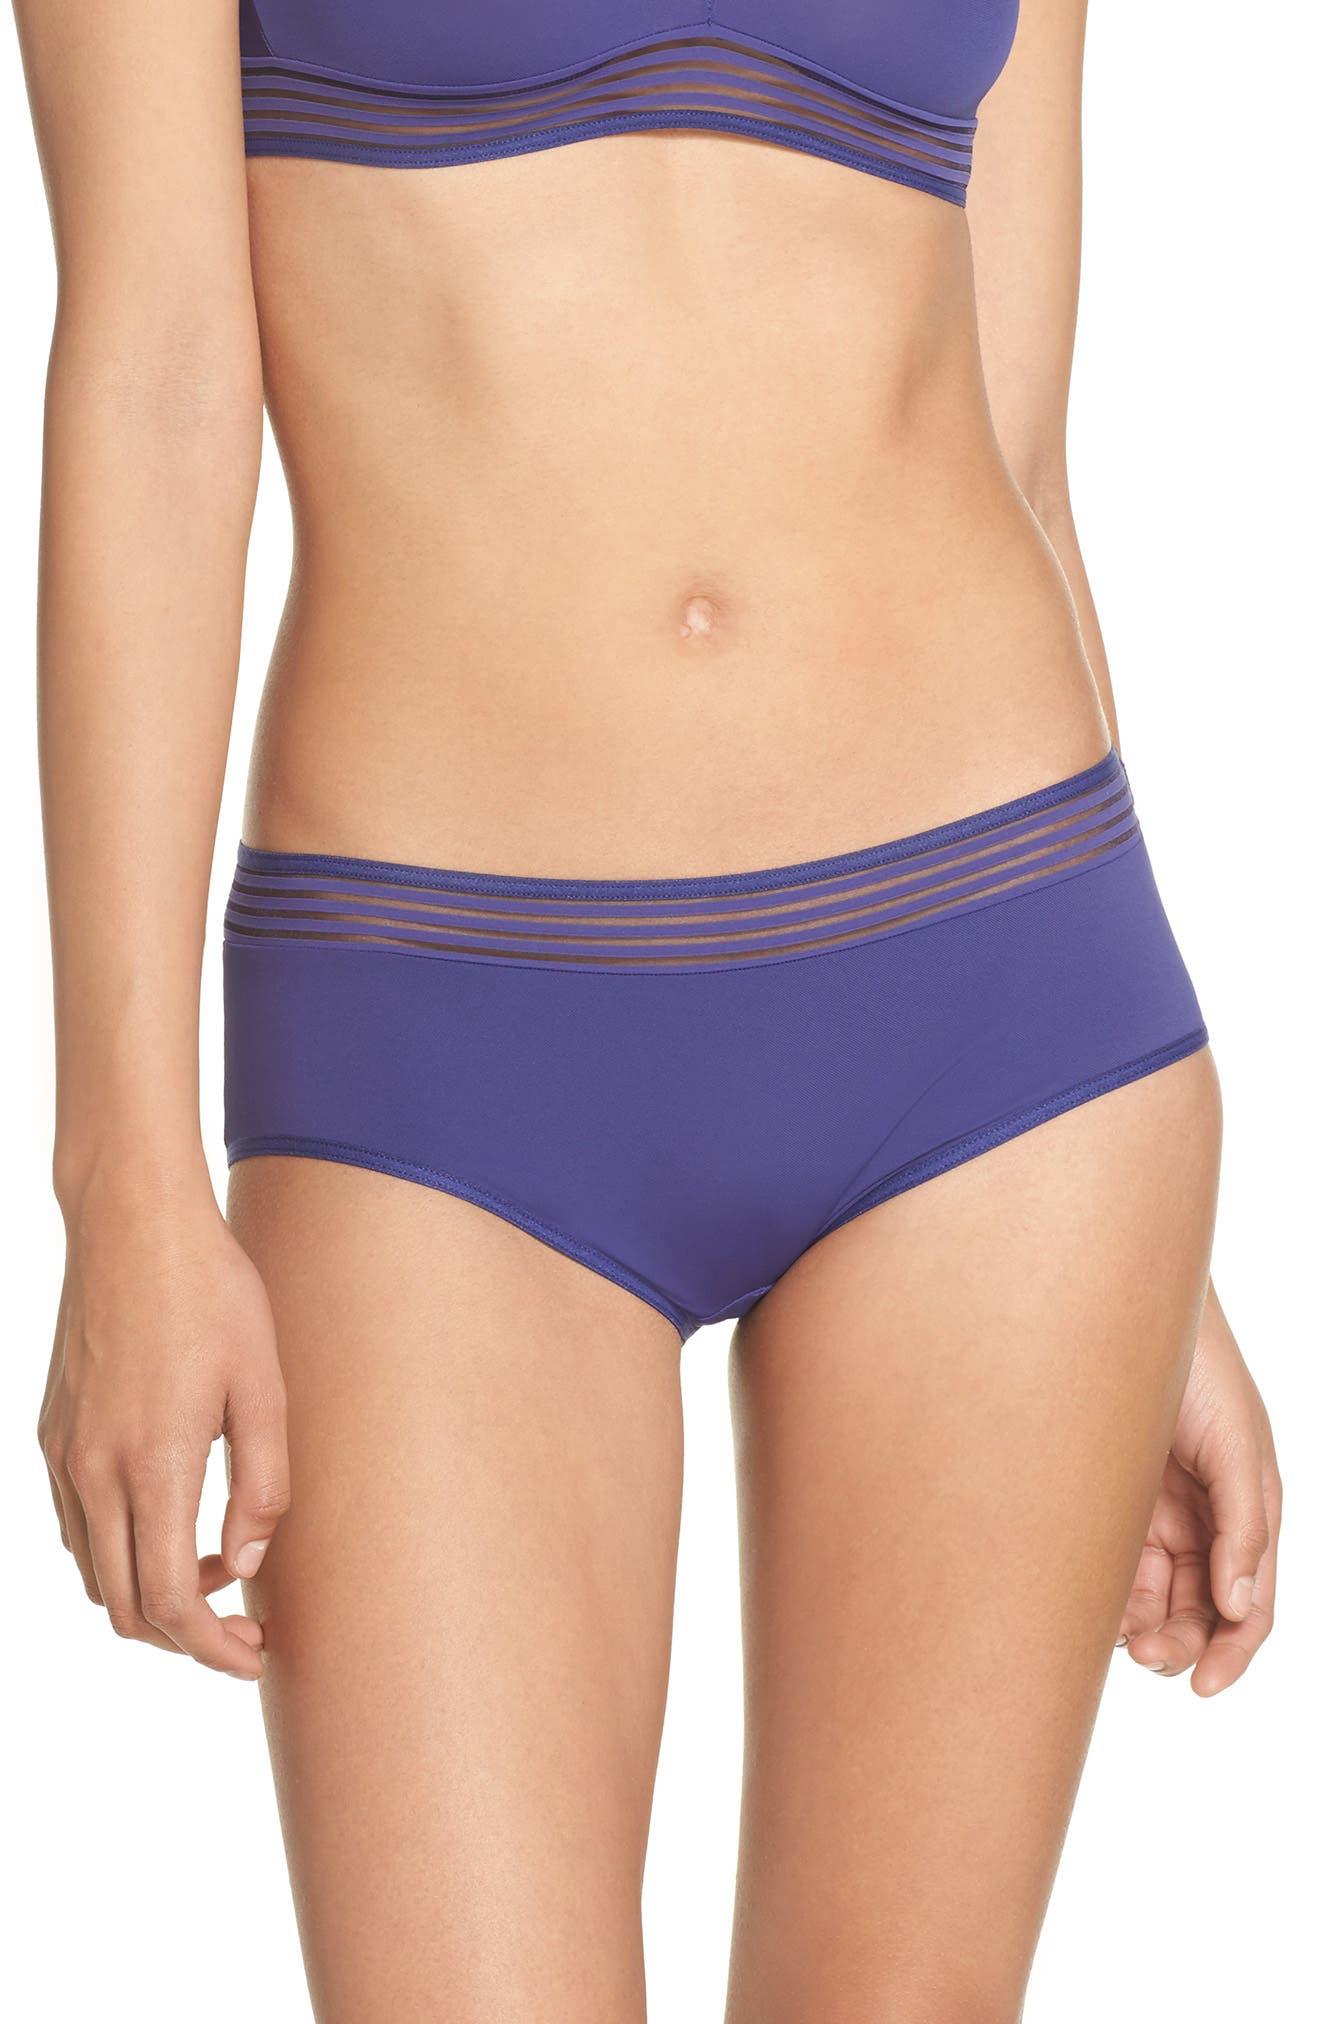 Cara Hipster Panties,                         Main,                         color, Violet Blue